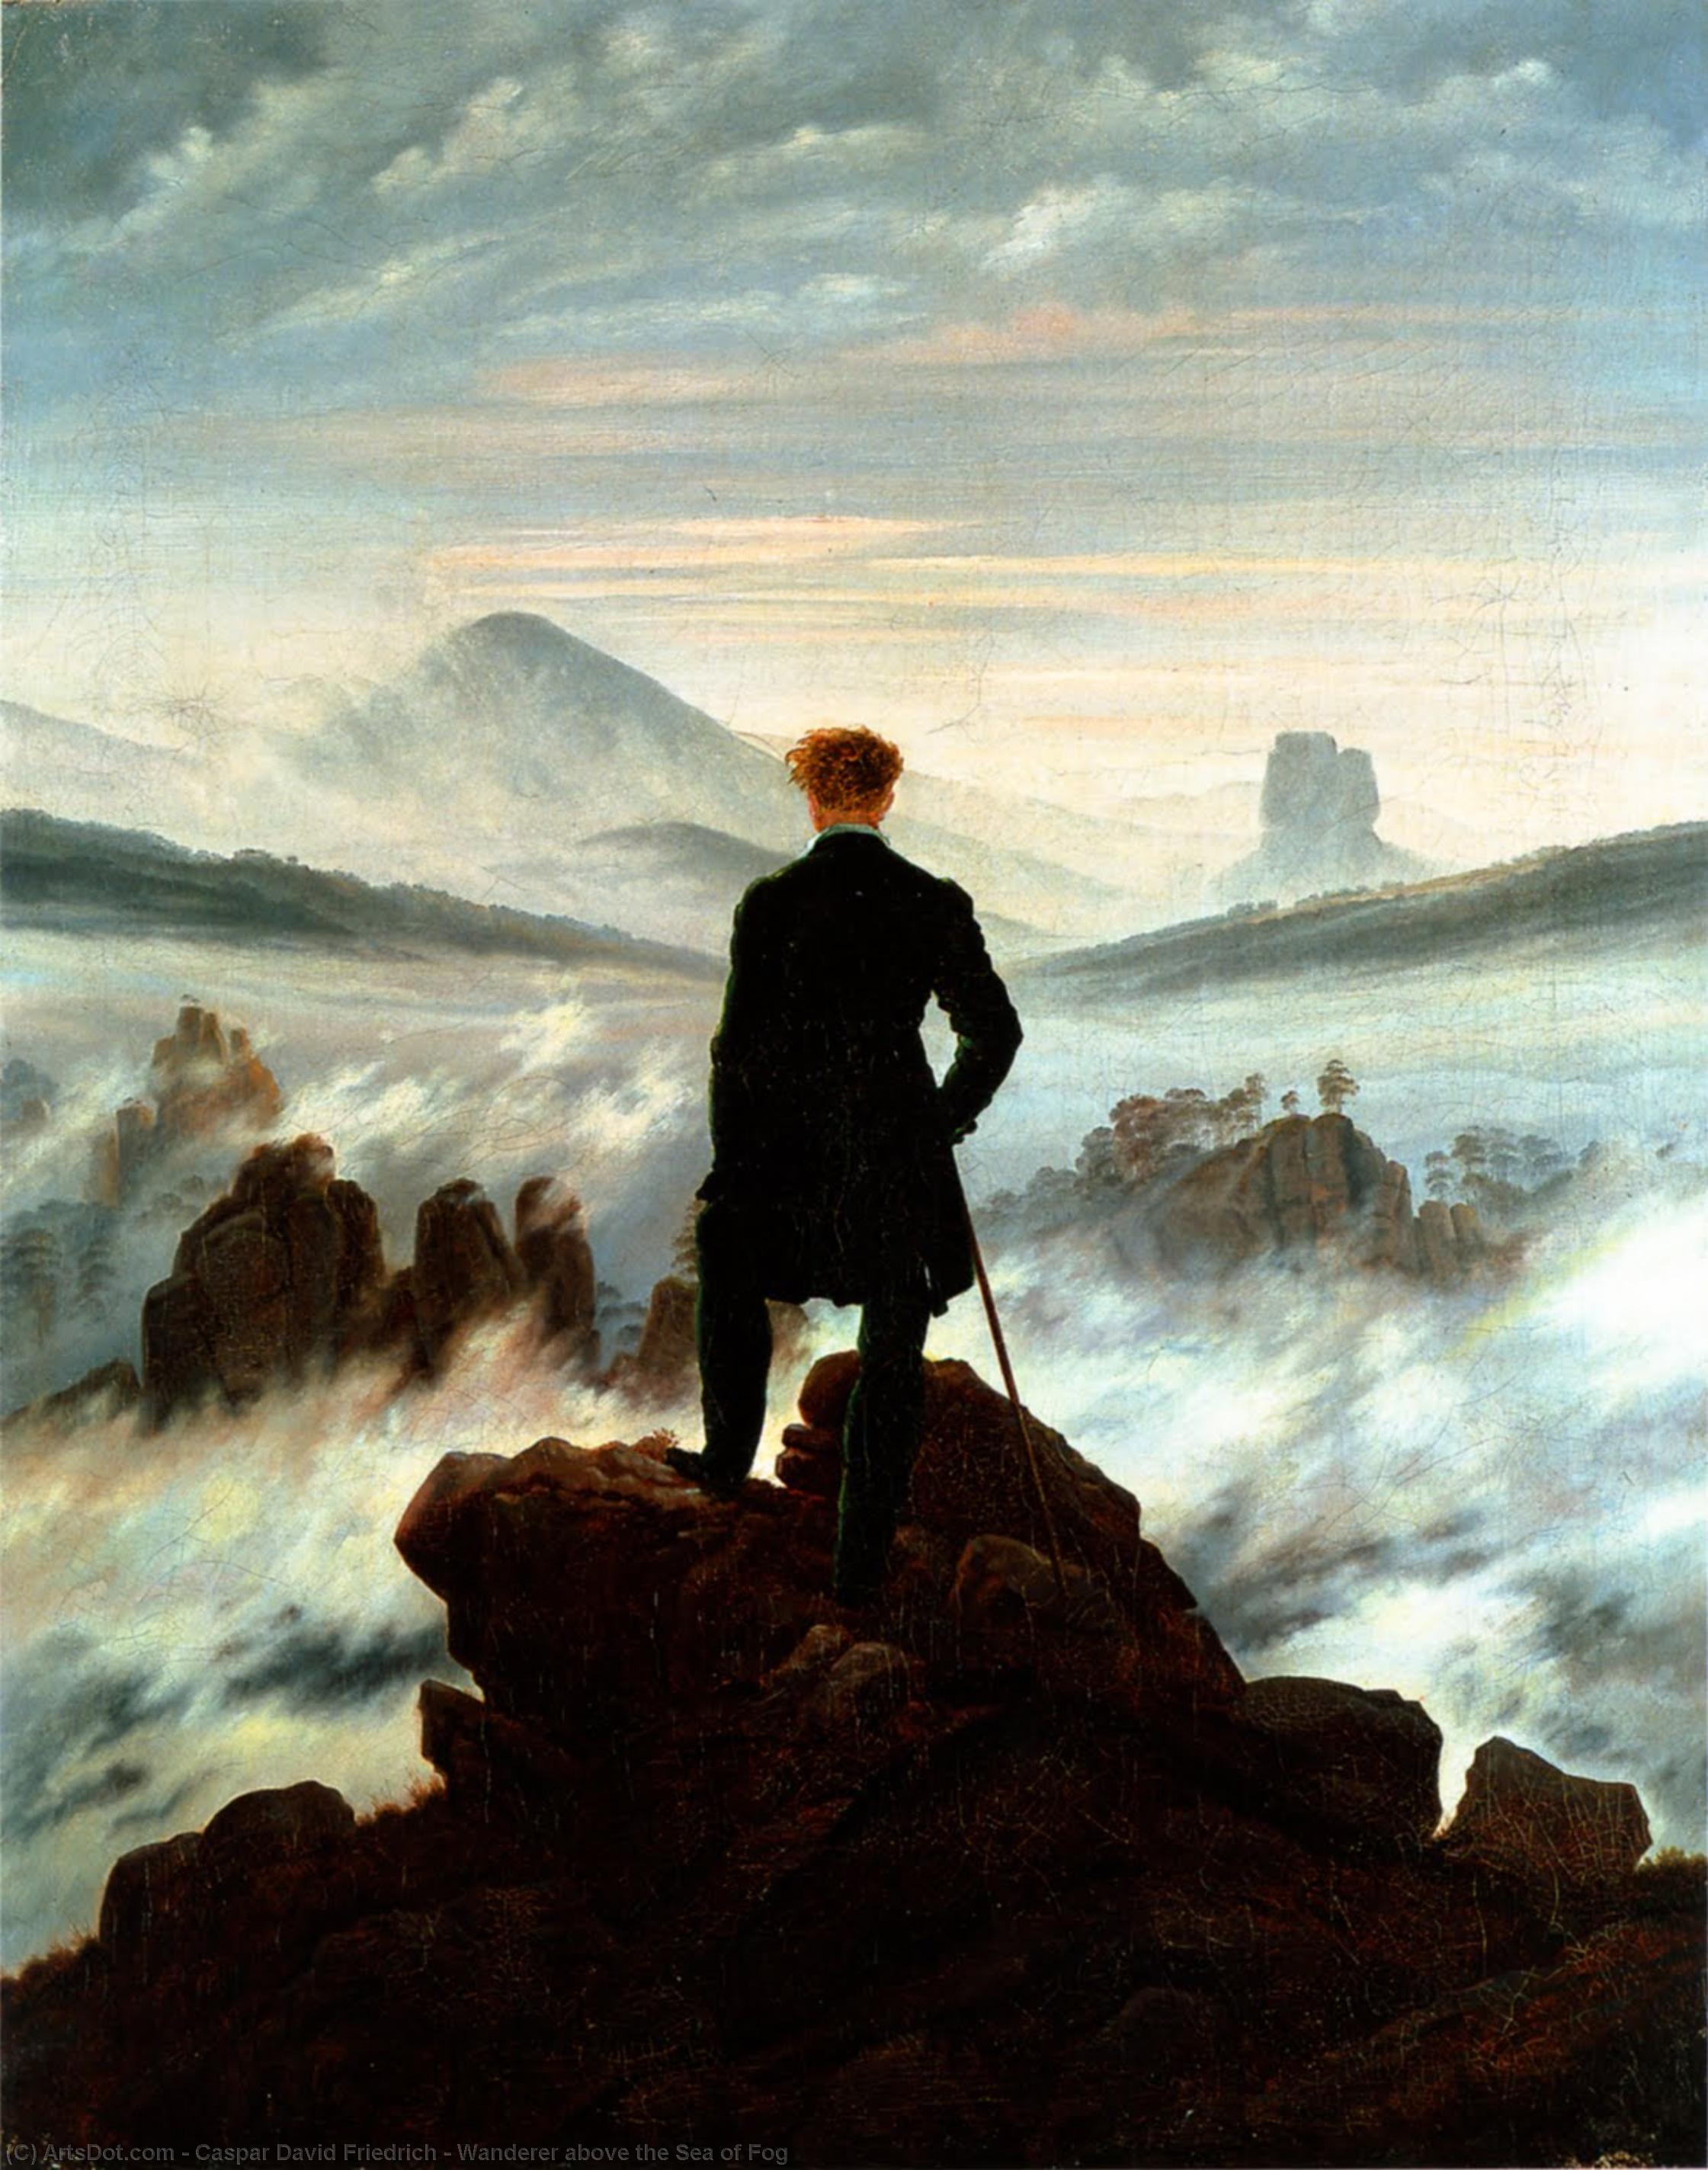 Wikioo.org - The Encyclopedia of Fine Arts - Painting, Artwork by Caspar David Friedrich - Wanderer above the Sea of Fog